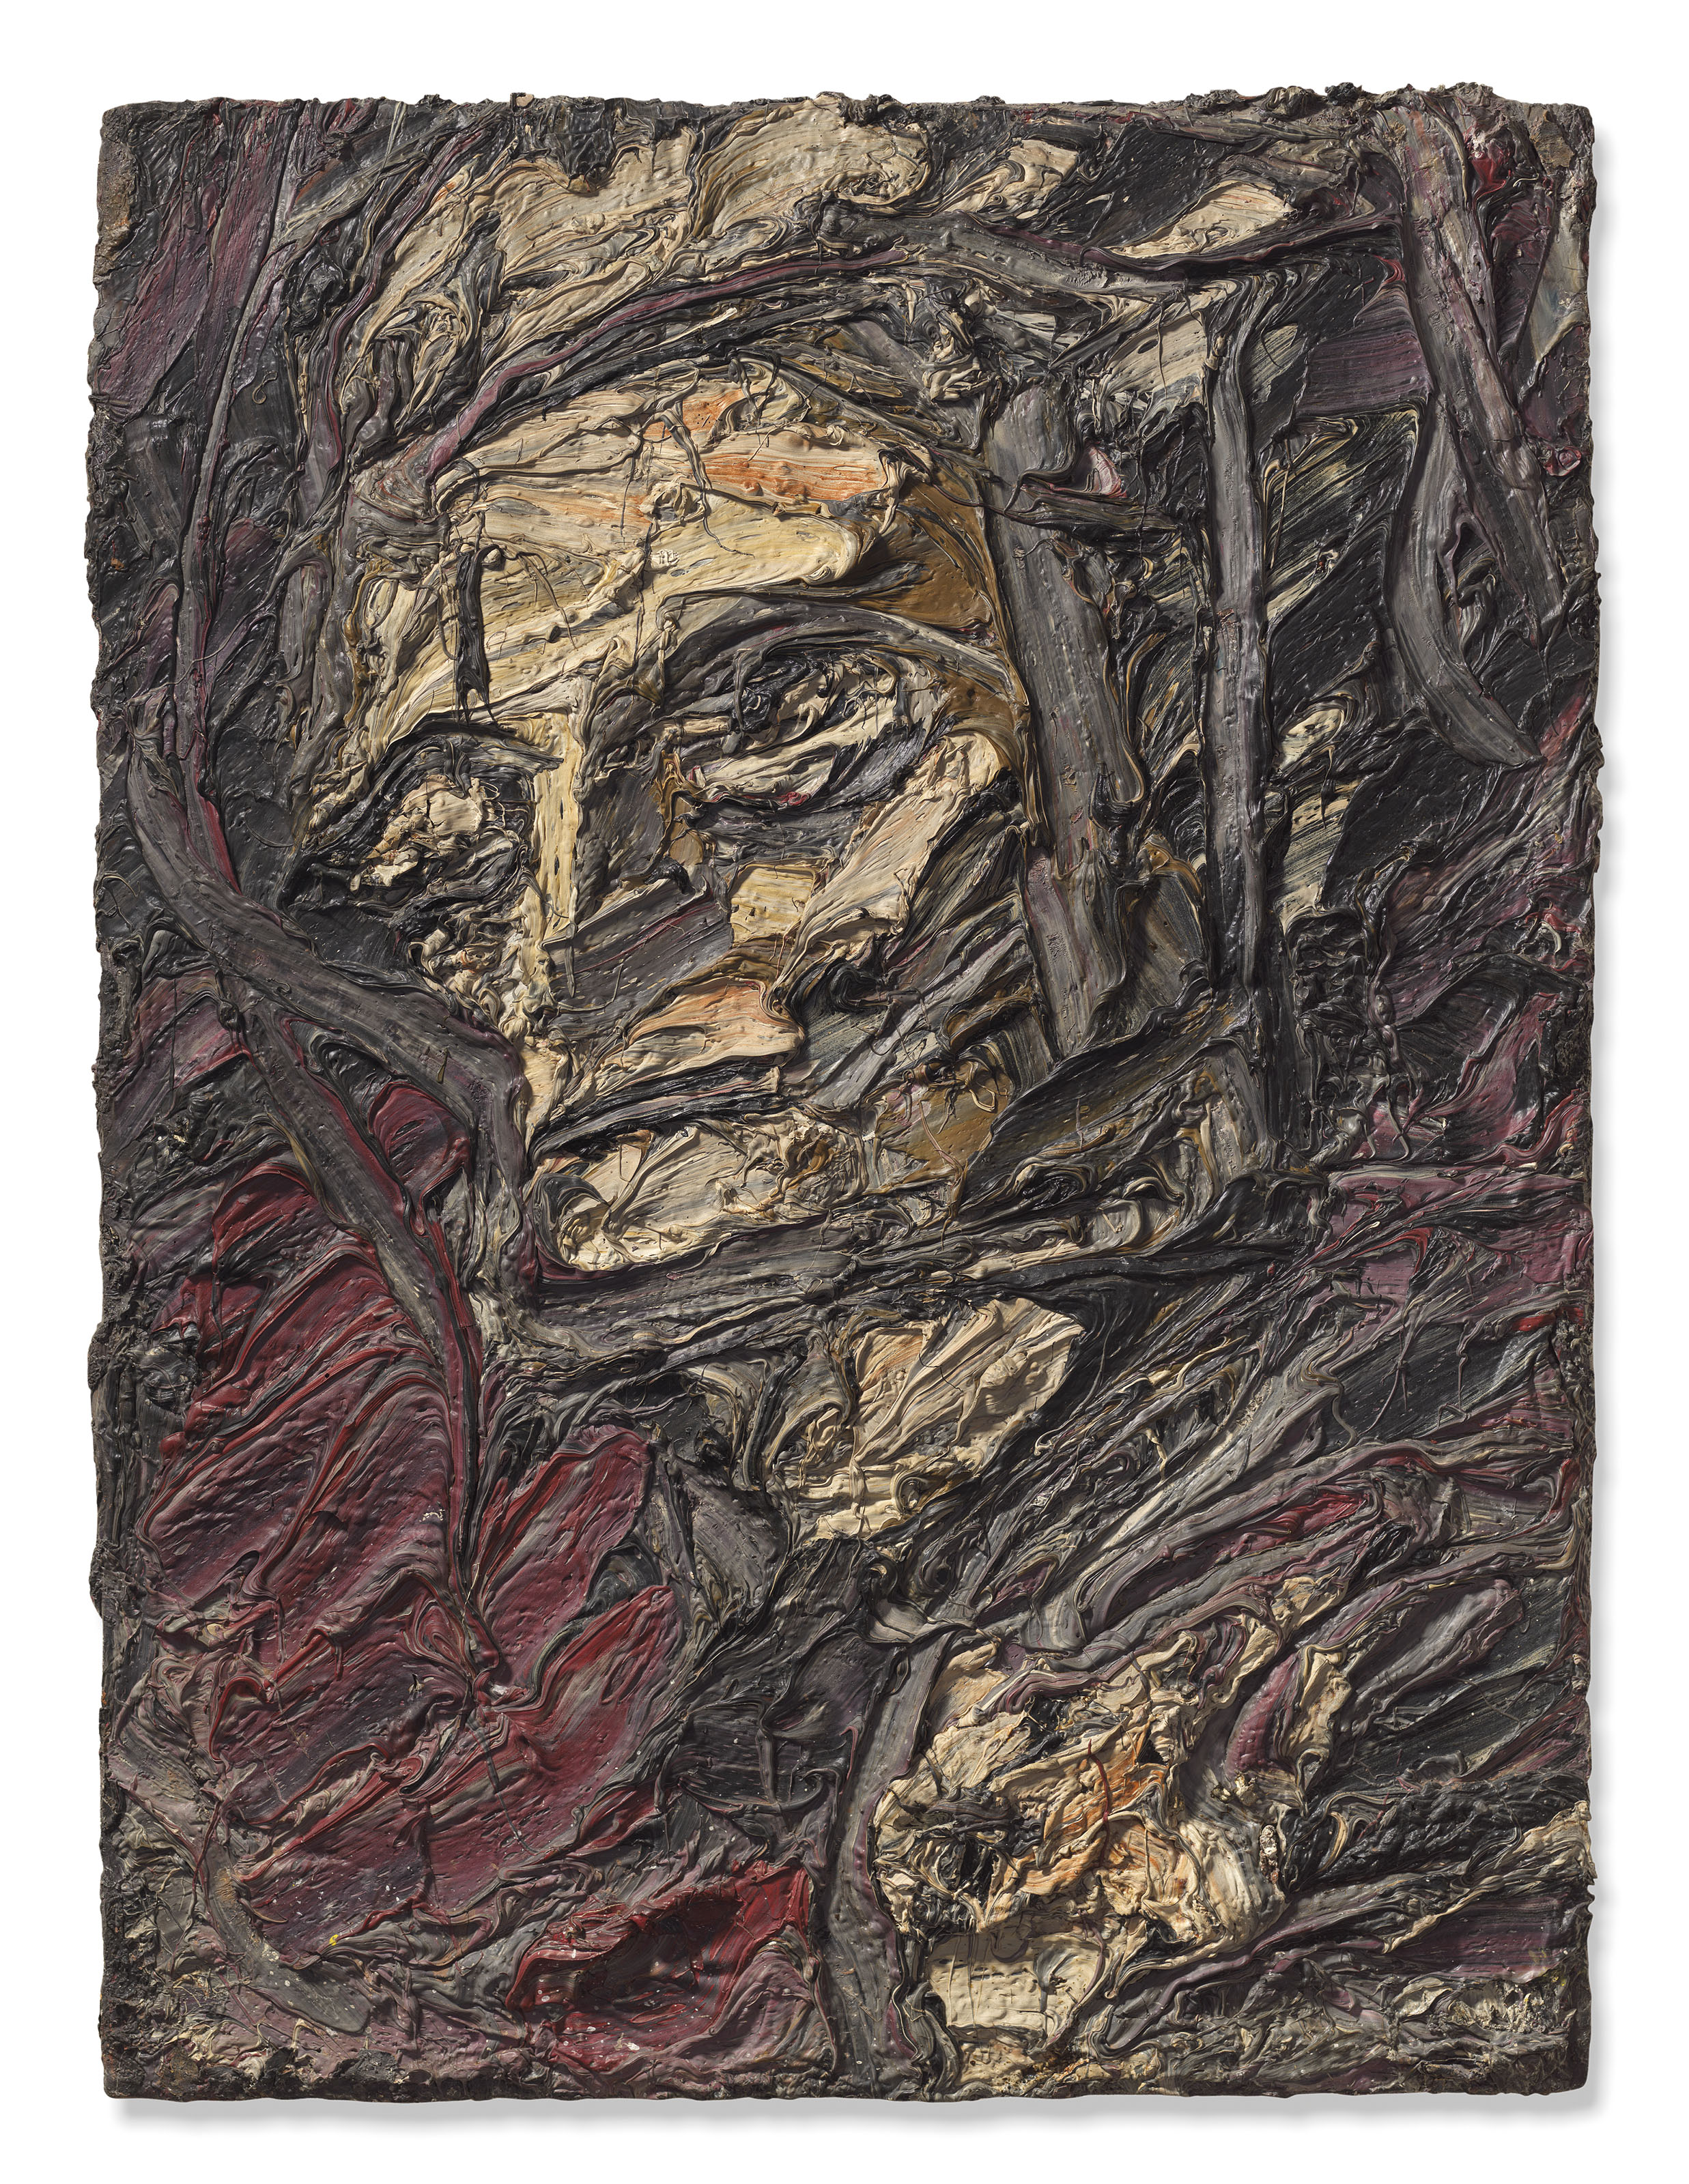 Leon Kossoff (1926-2019)